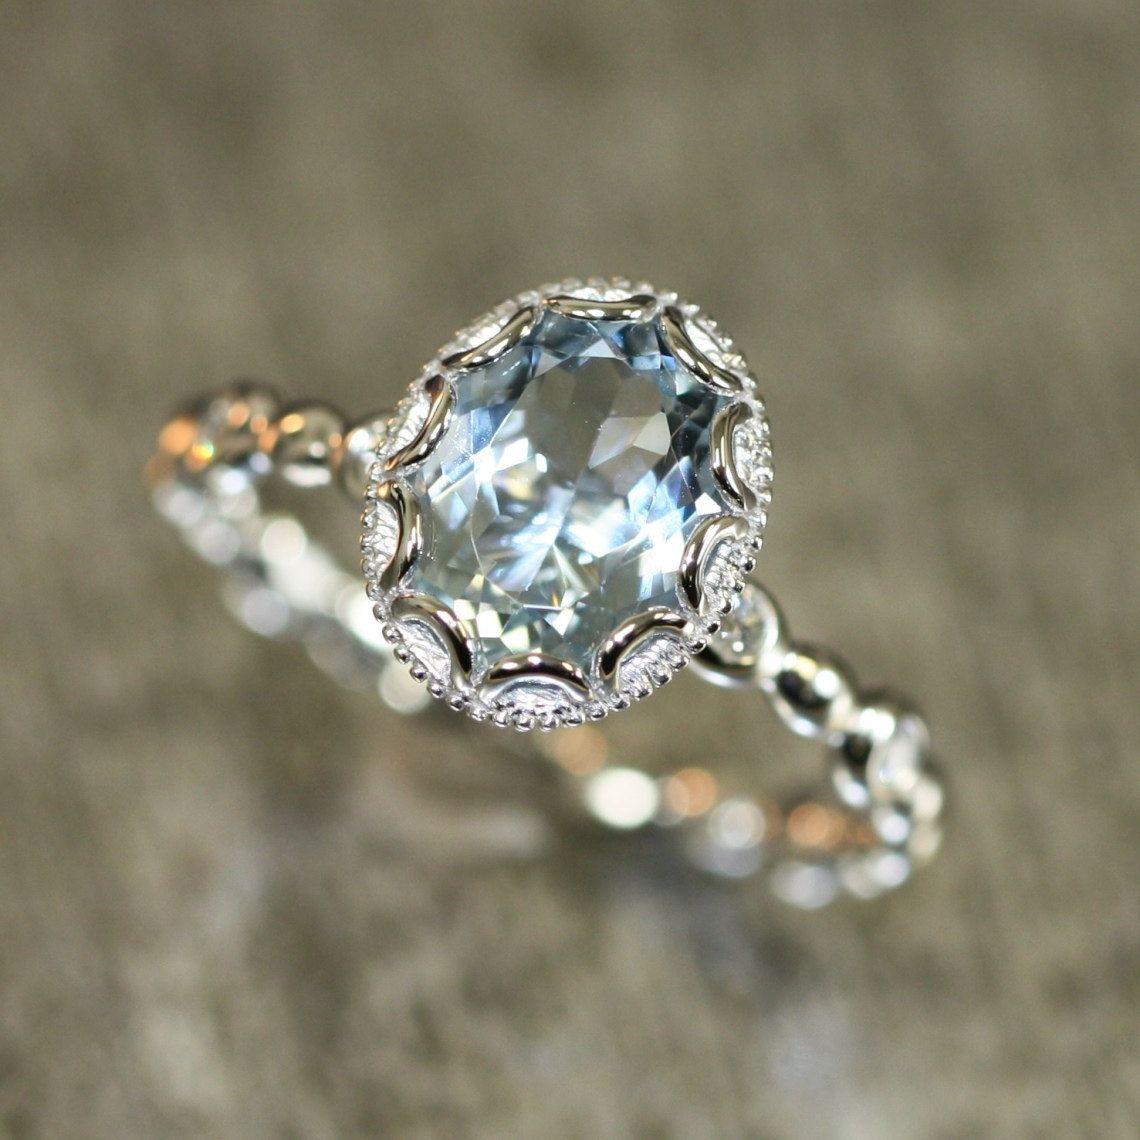 marine wedding rings Floral Aquamarine Engagement Ring in 14k White Gold Pebble Diamond Wedding Band mm Oval Aquamarine Ring March Birthstone Gemstone Ring